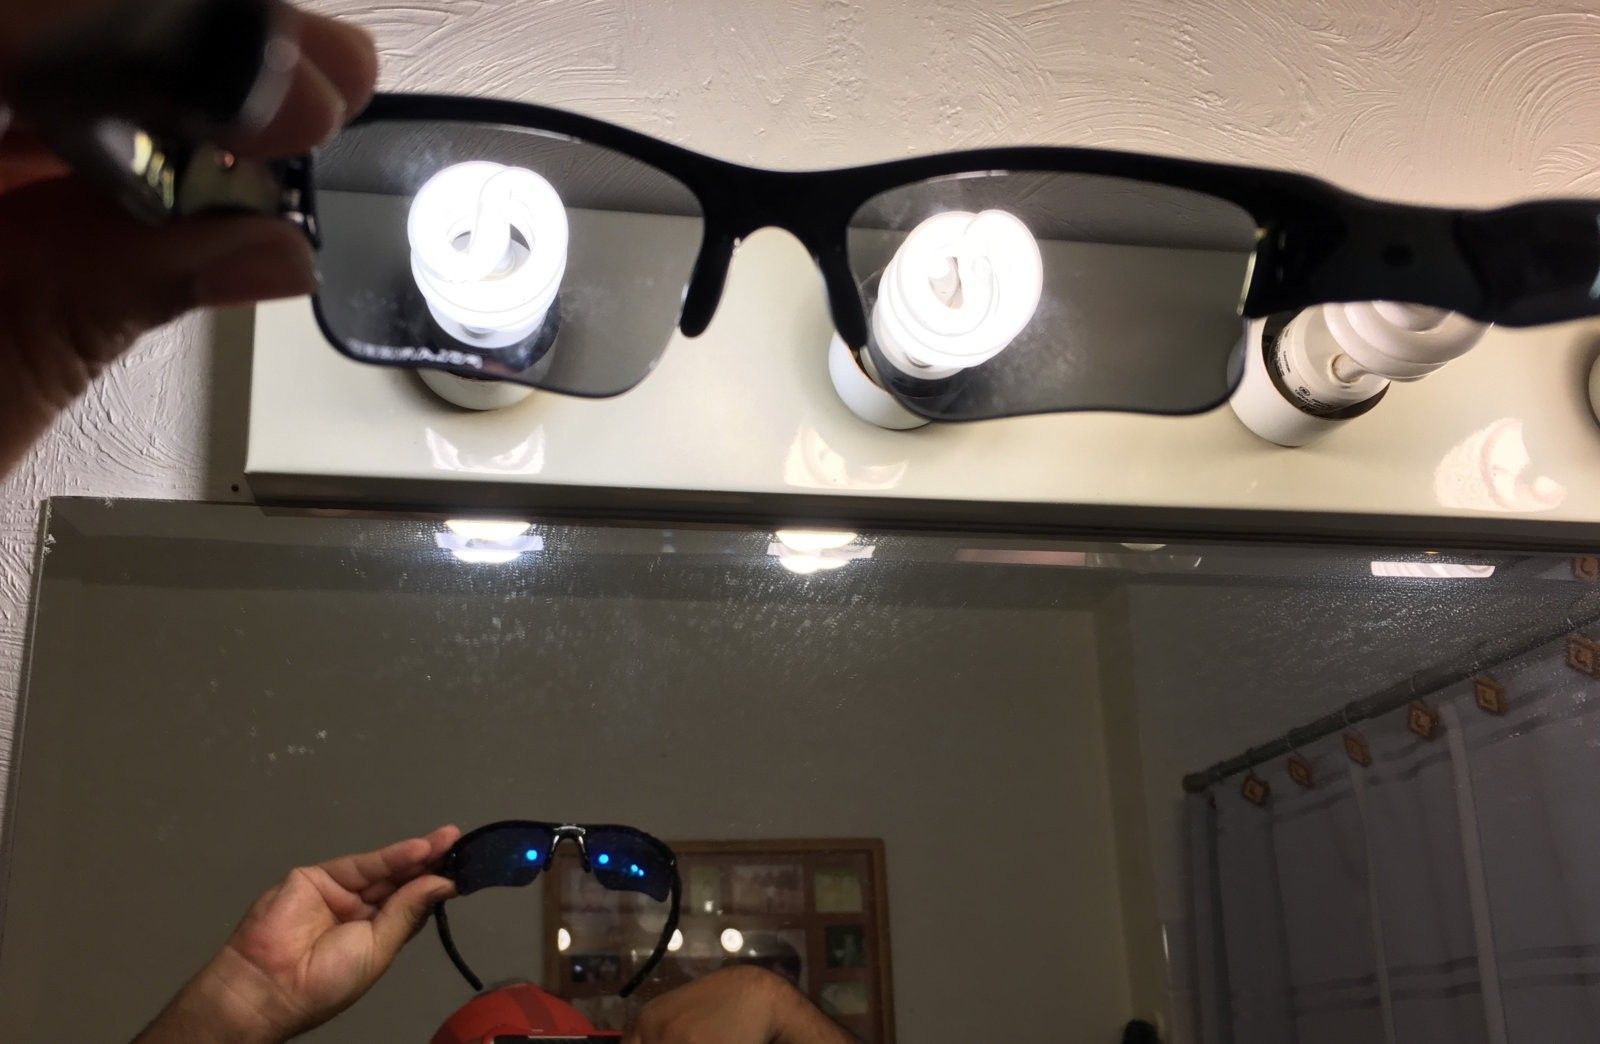 Flak Jacket 1.0 - 2 pairs - Polarized lenses - 2016-07-07 19.23.40.jpg